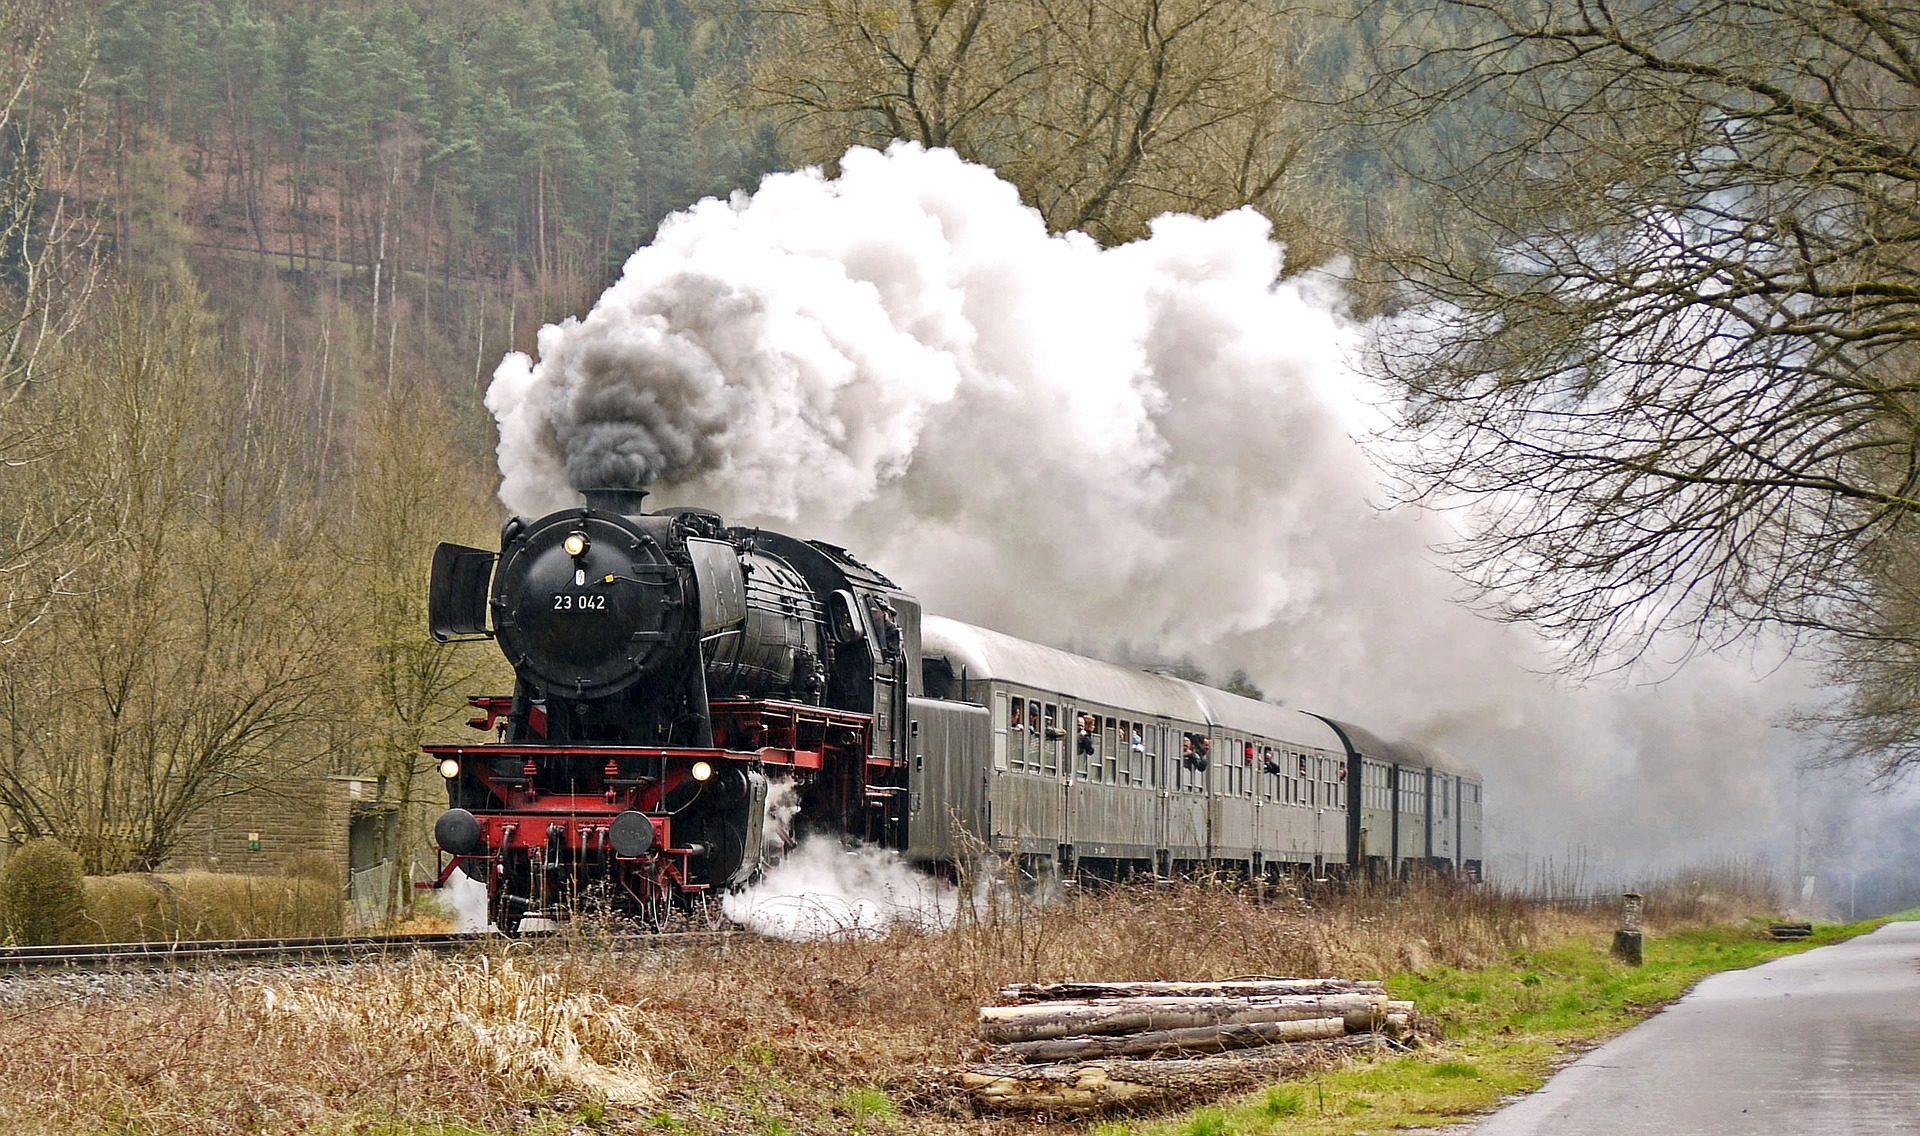 tren, locomotora, vapor, humo, pasajeros, gente - Fondos de Pantalla HD - professor-falken.com